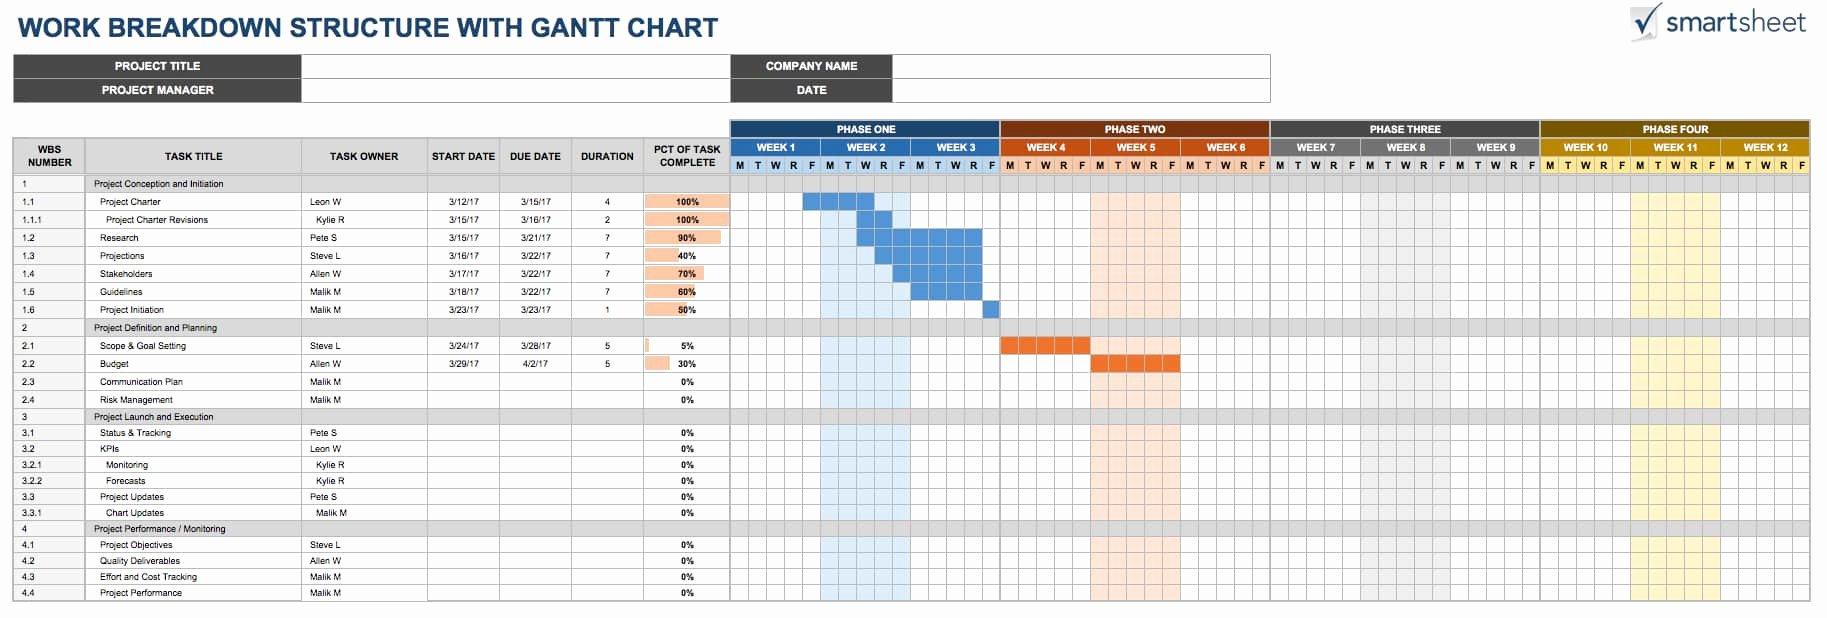 Work Breakdown Structure Template Excel Fresh Free Work Breakdown Structure Templatessmartsheet